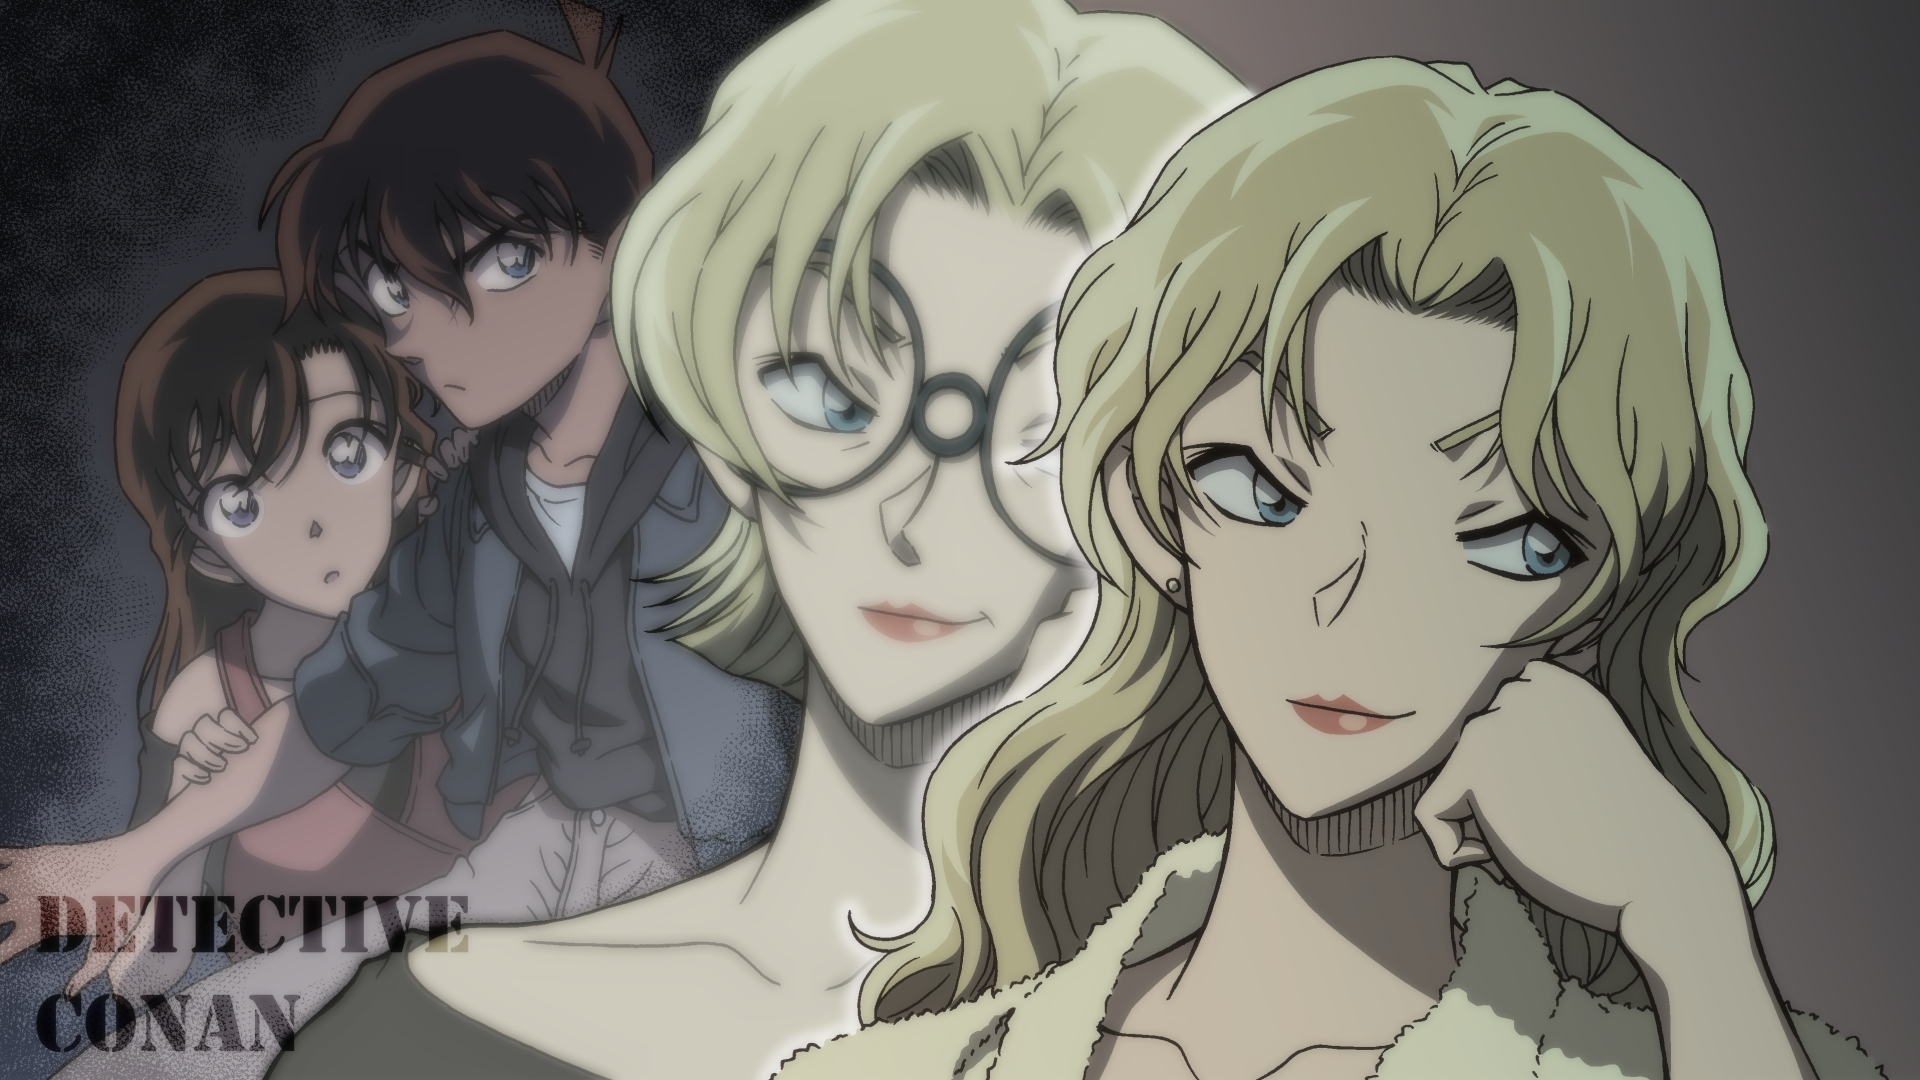 Meitantei Conan (Detective Conan) - Aoyama Goushou - HD ...